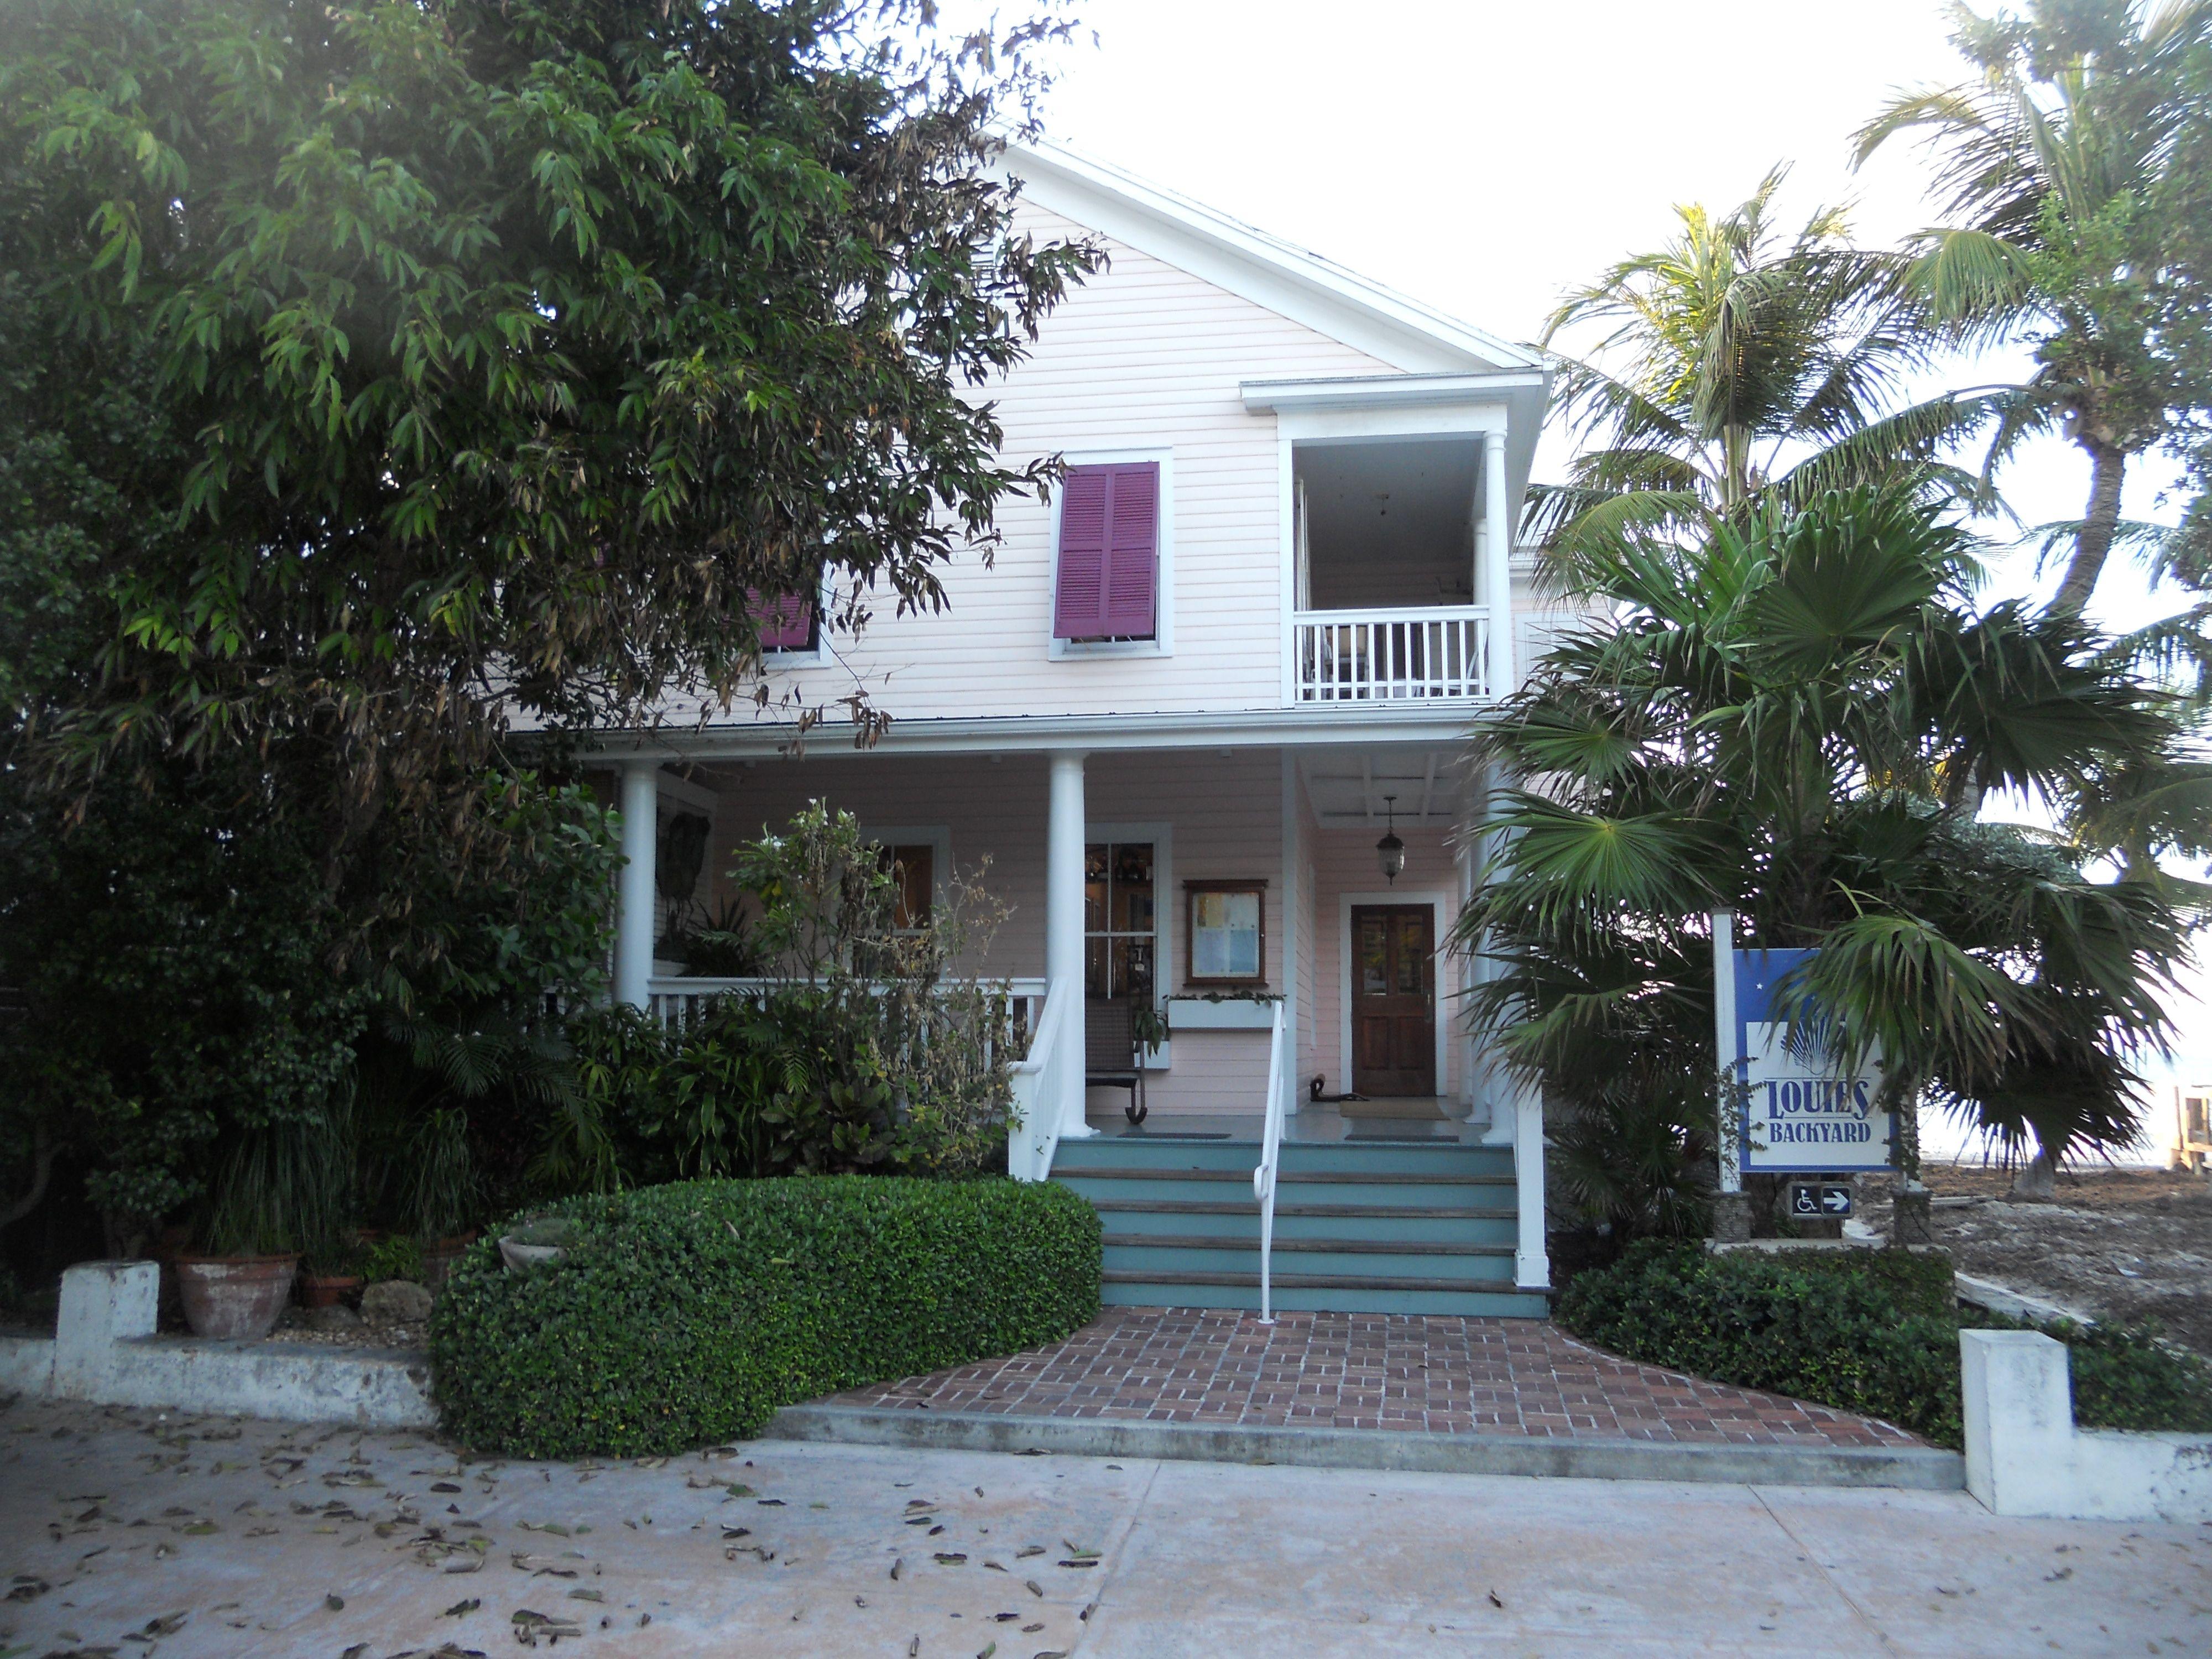 Louie's Backyard at Key West, Florida. | Key west